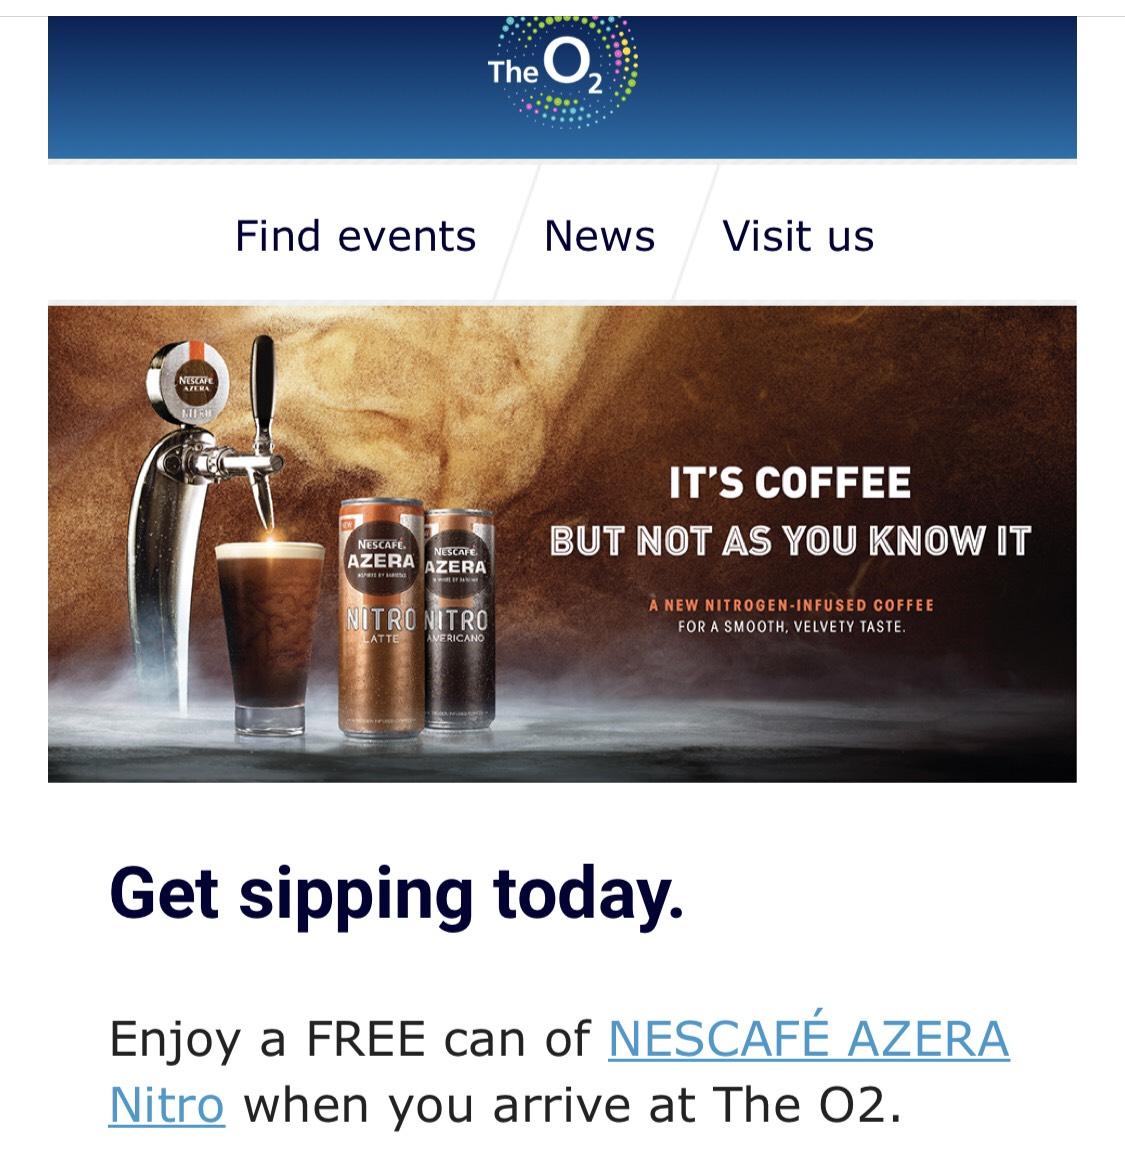 Free Nescafé Azera Nitro Coffee at o2 London Today